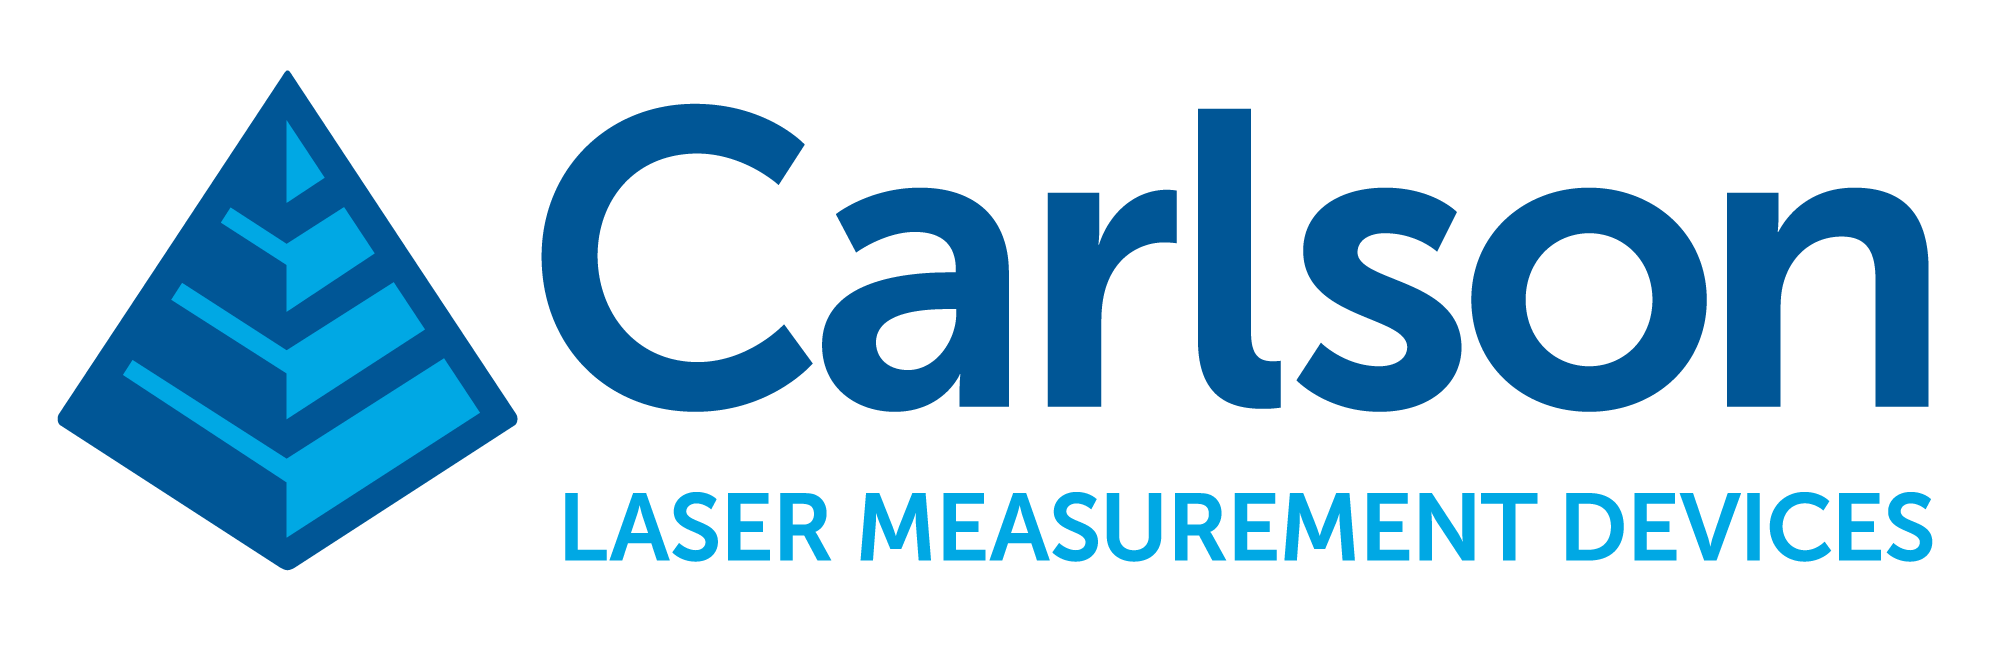 Carlson_Boretrak_2